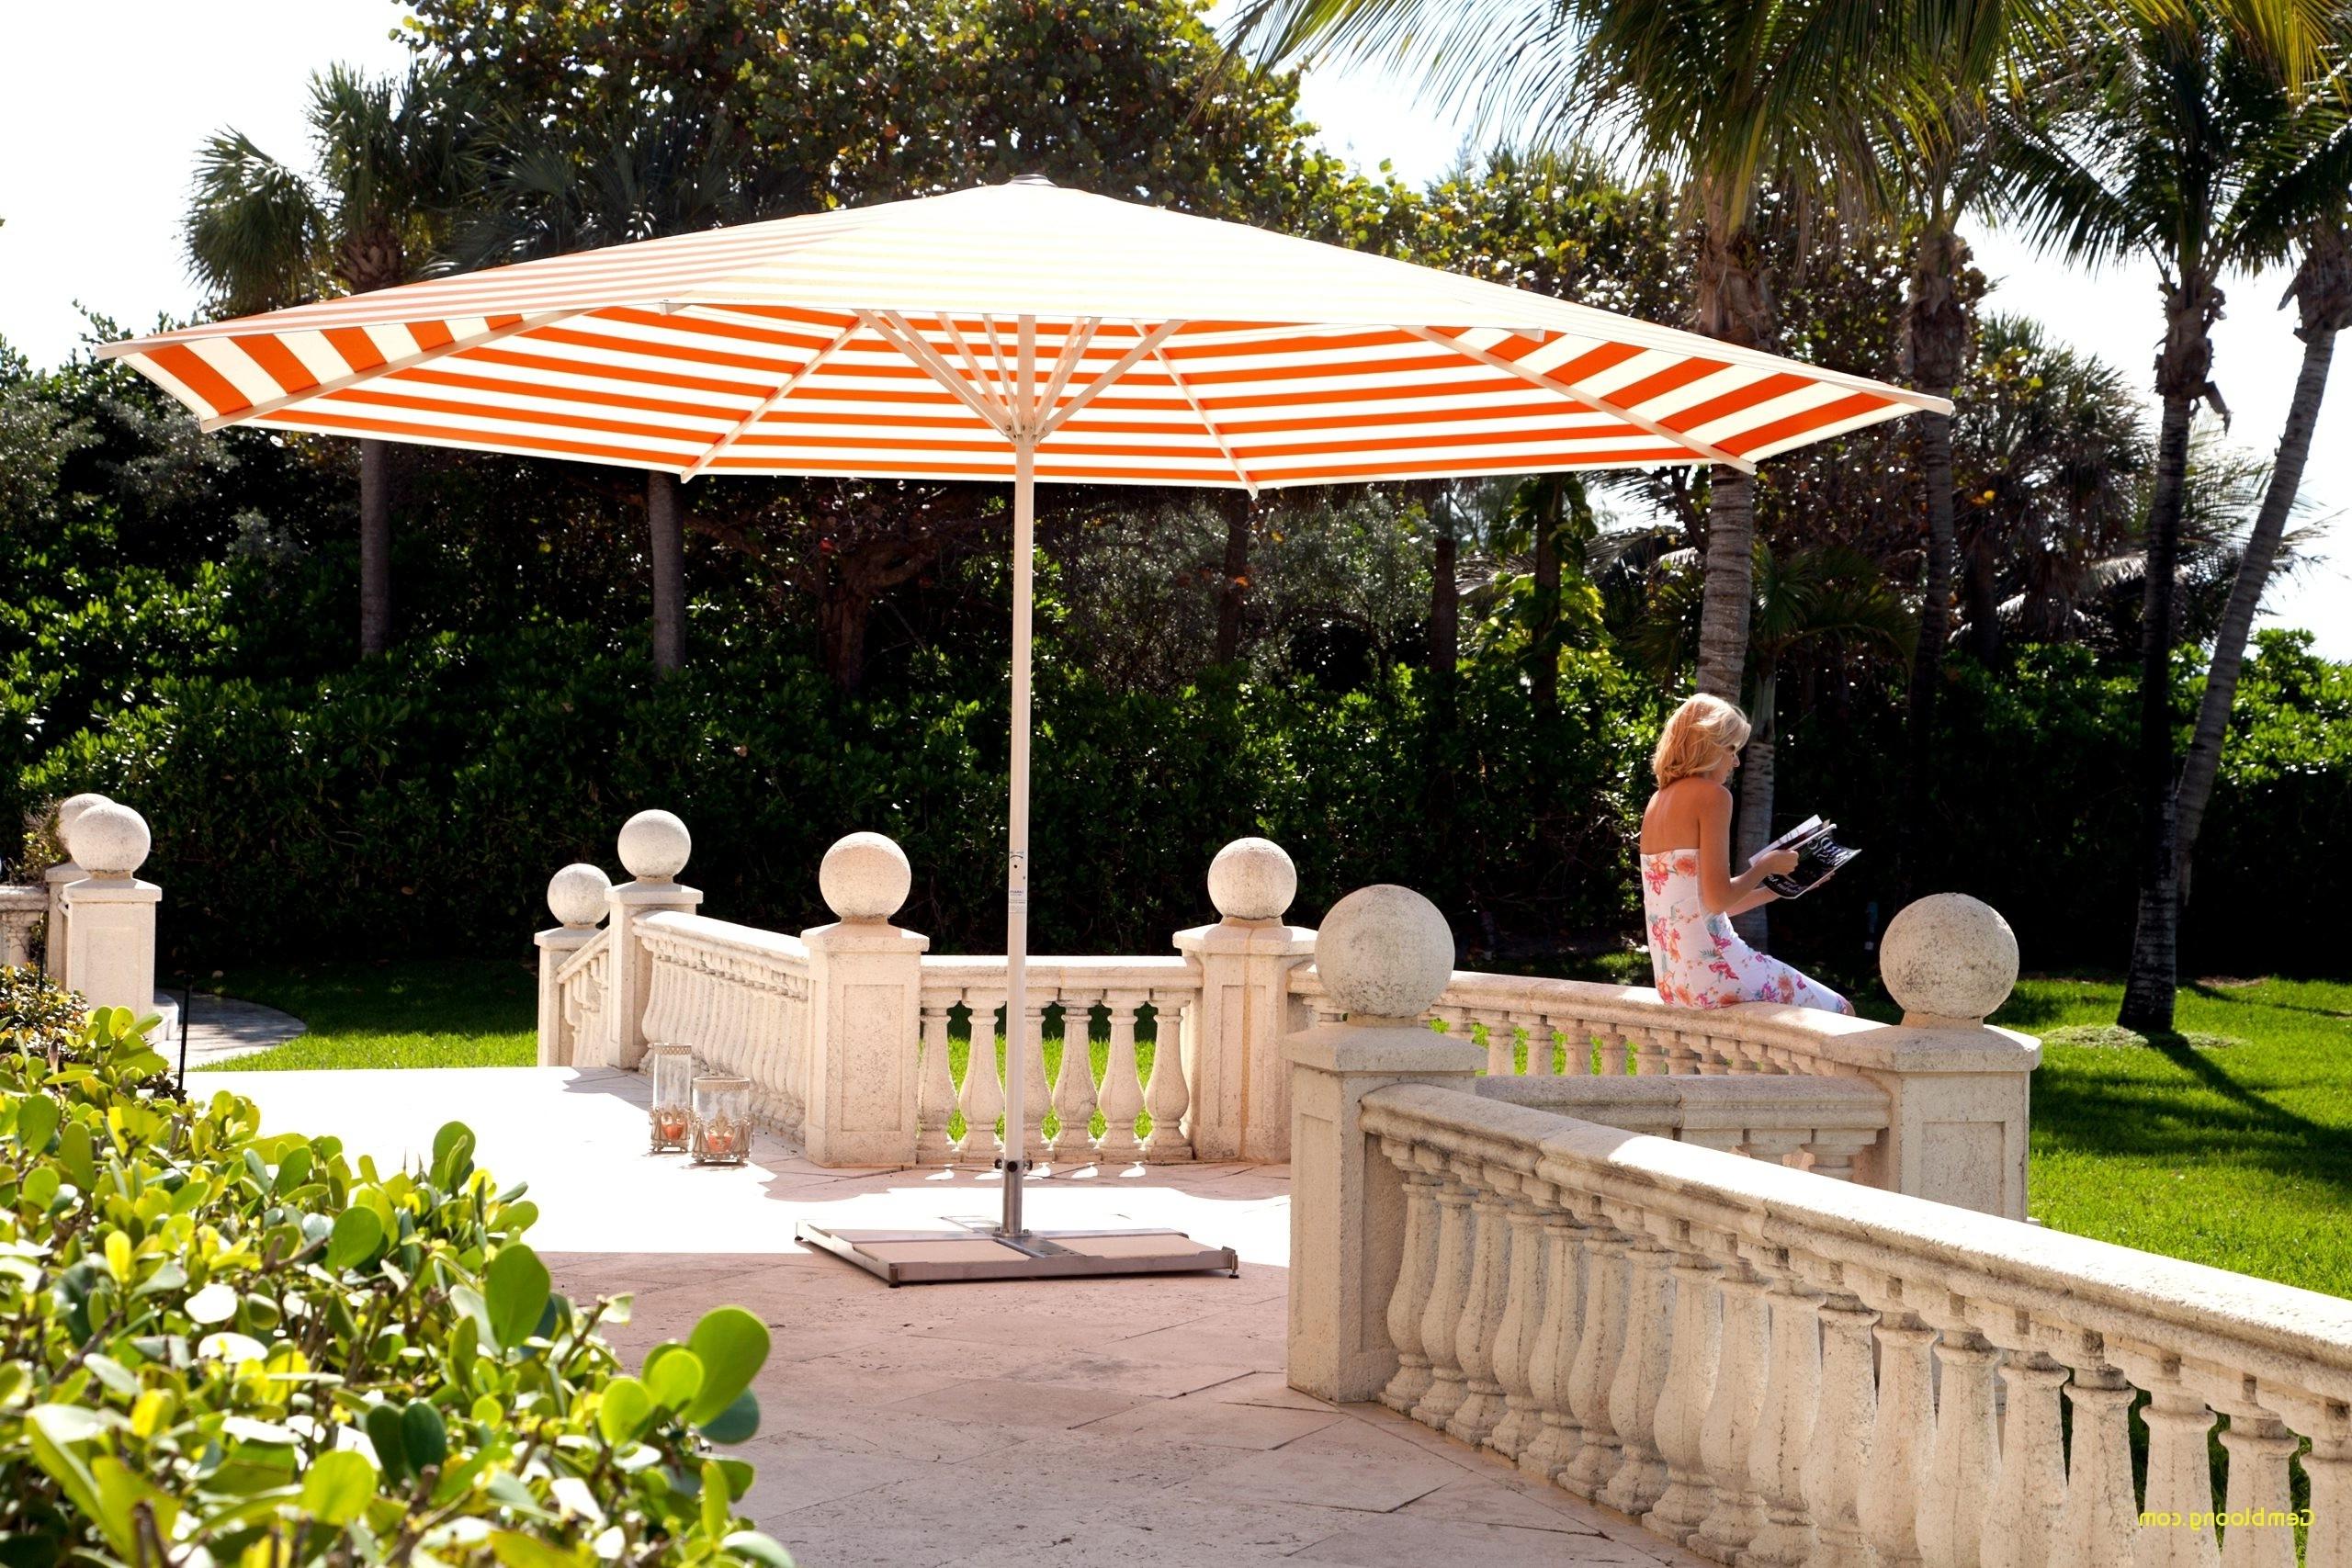 Lots Patio Umbrella Best Of 25 Fresh Regarding Most Cur